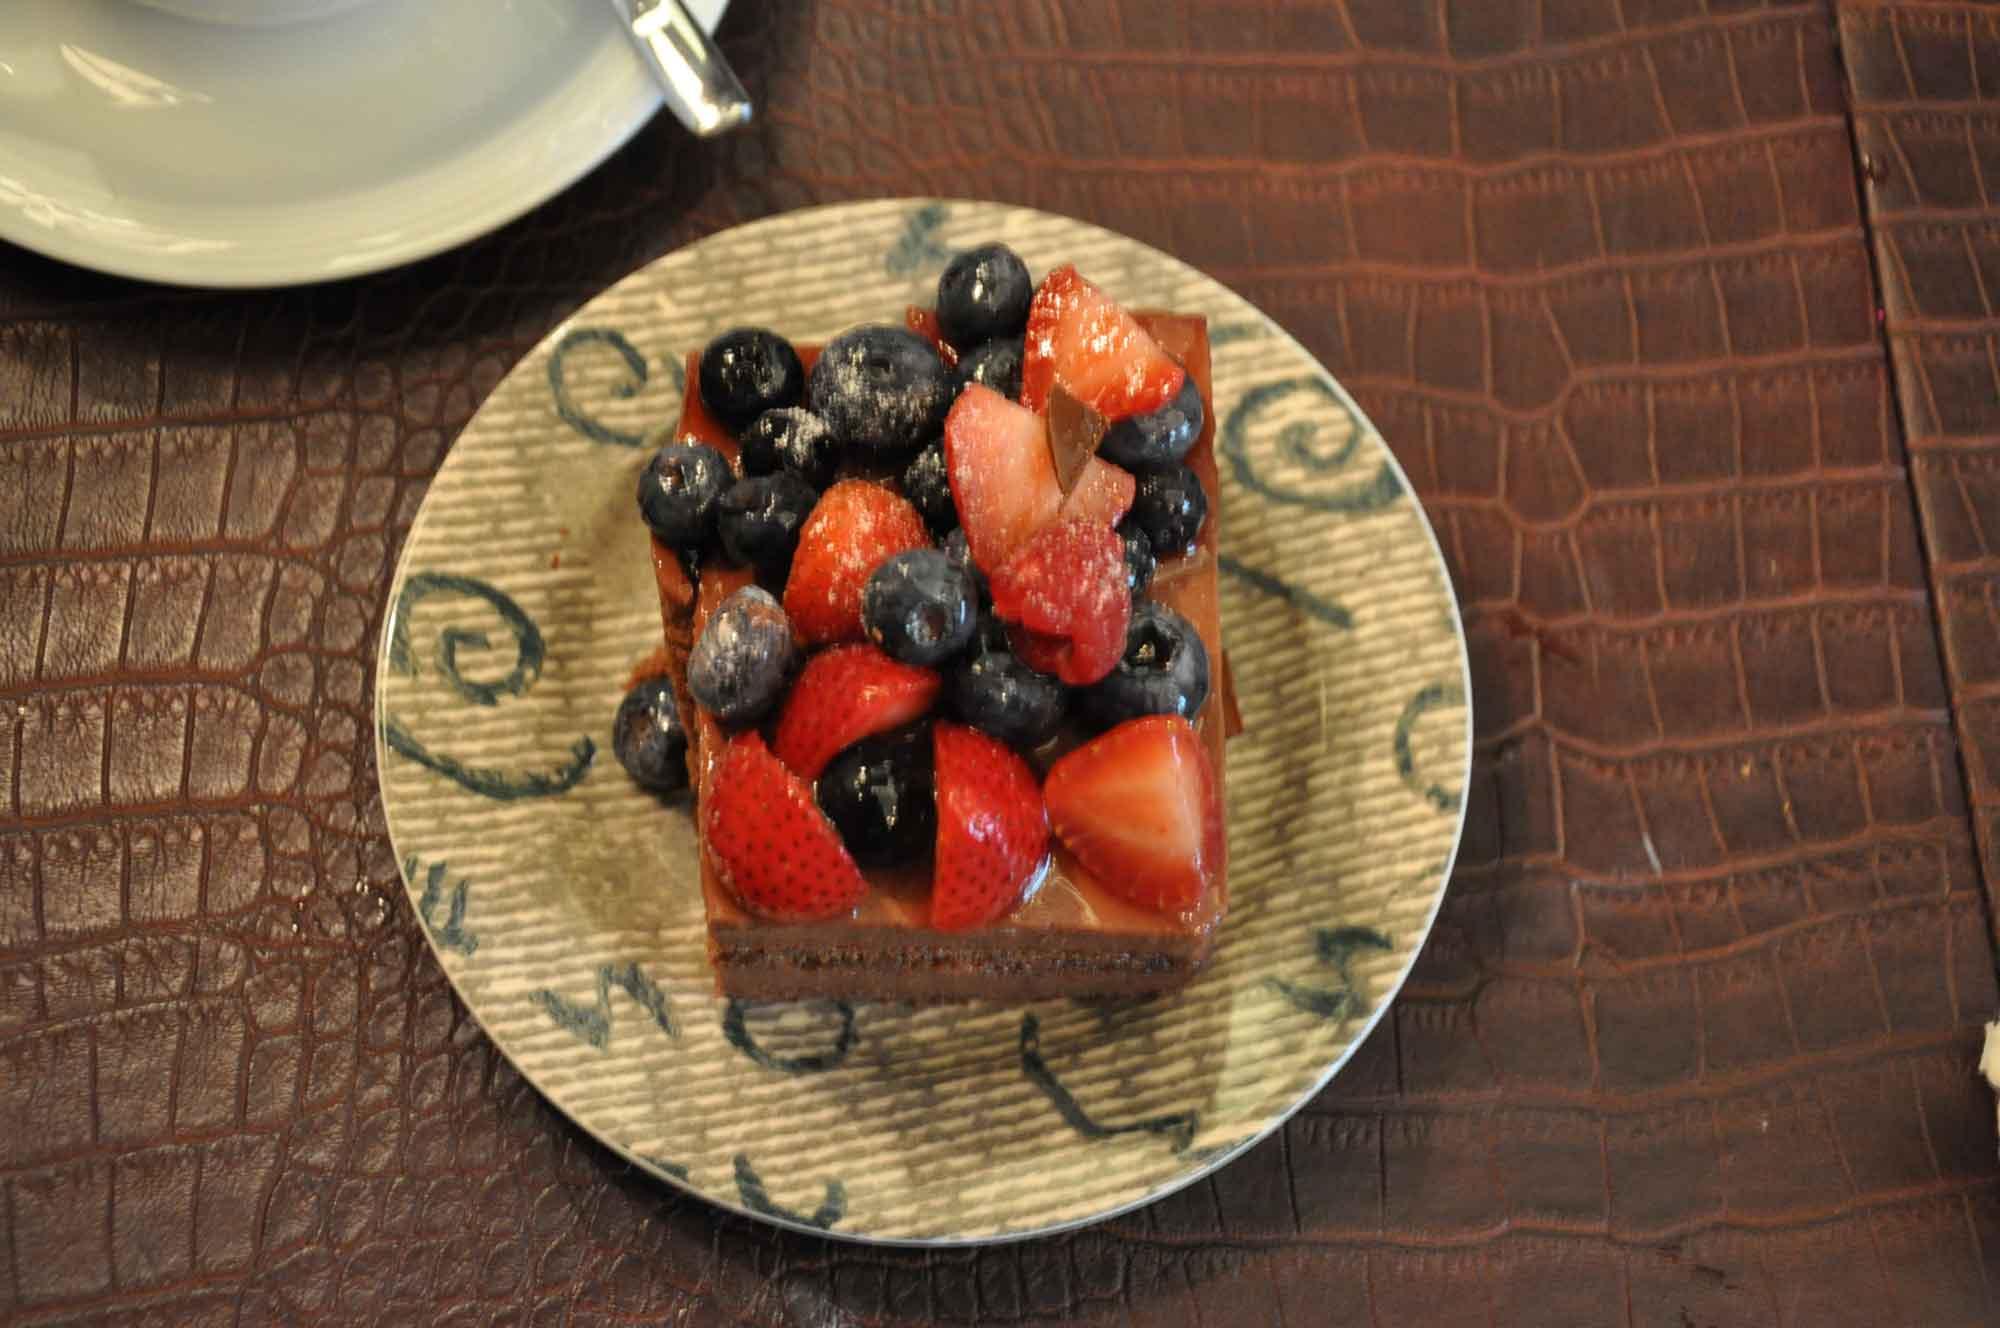 Lisboa Dessert Stand Chocolate Cake with fruit